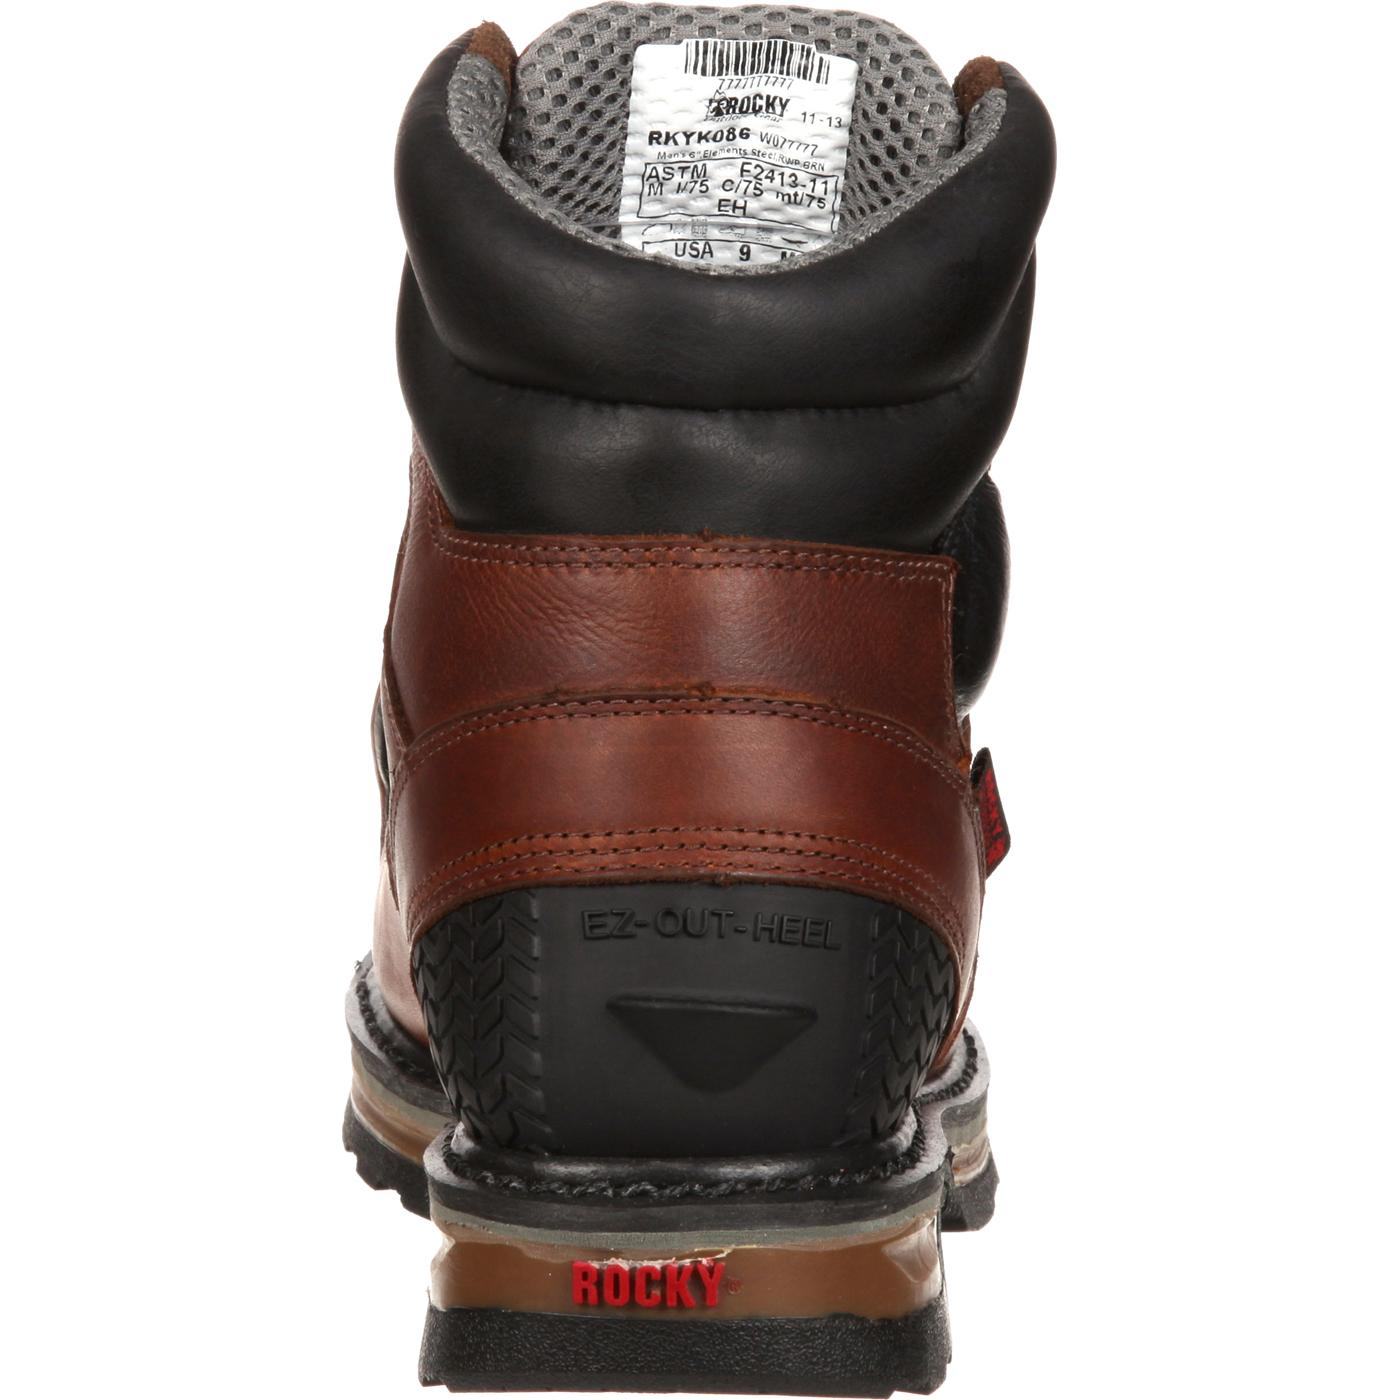 Rocky Elements Waterproof Steel Toe Met Guard Work Boot